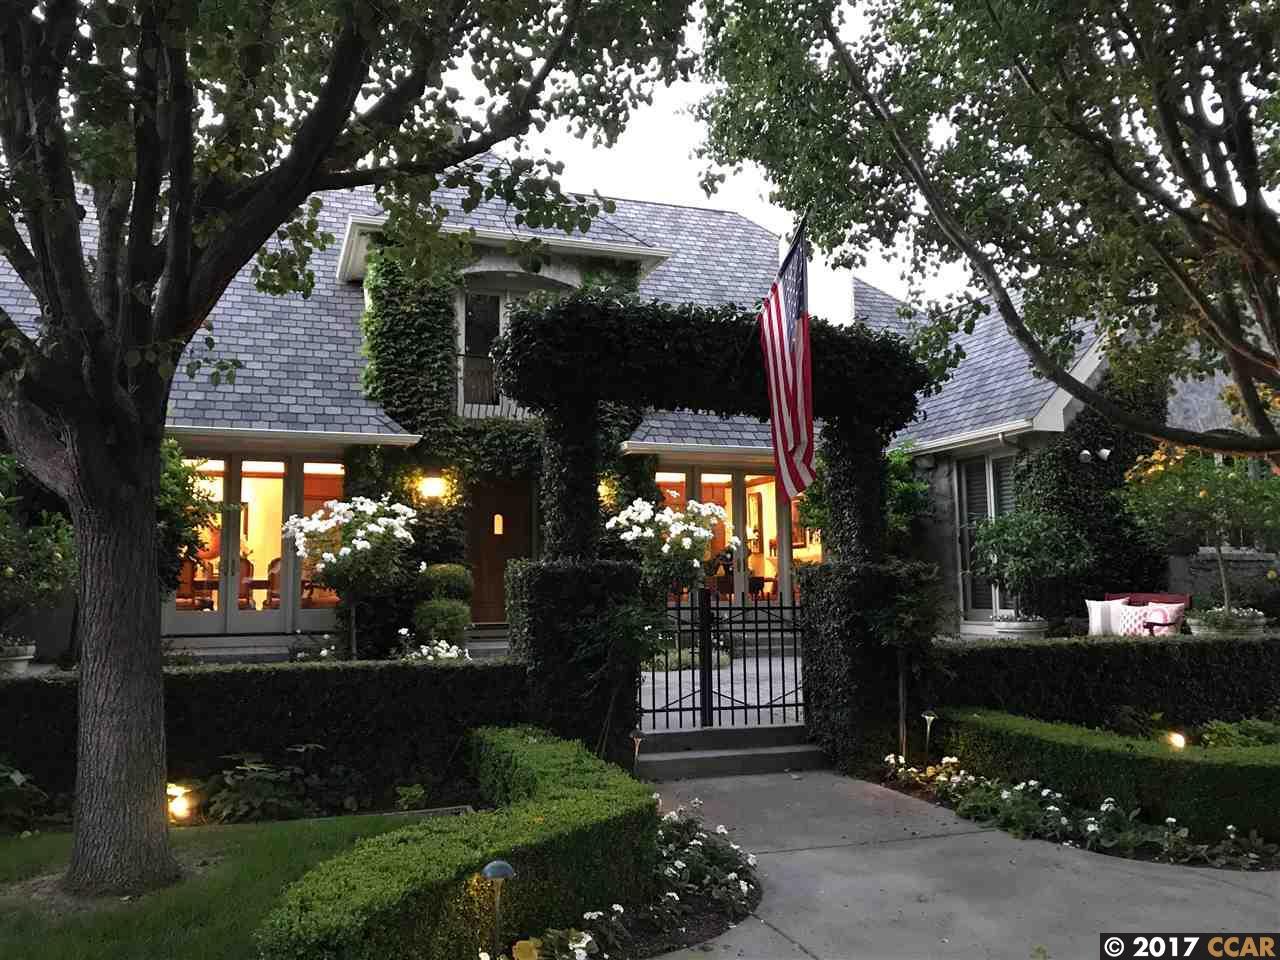 Single Family Home for Sale at 1849 Alameda Diablo Diablo, California 94528 United States